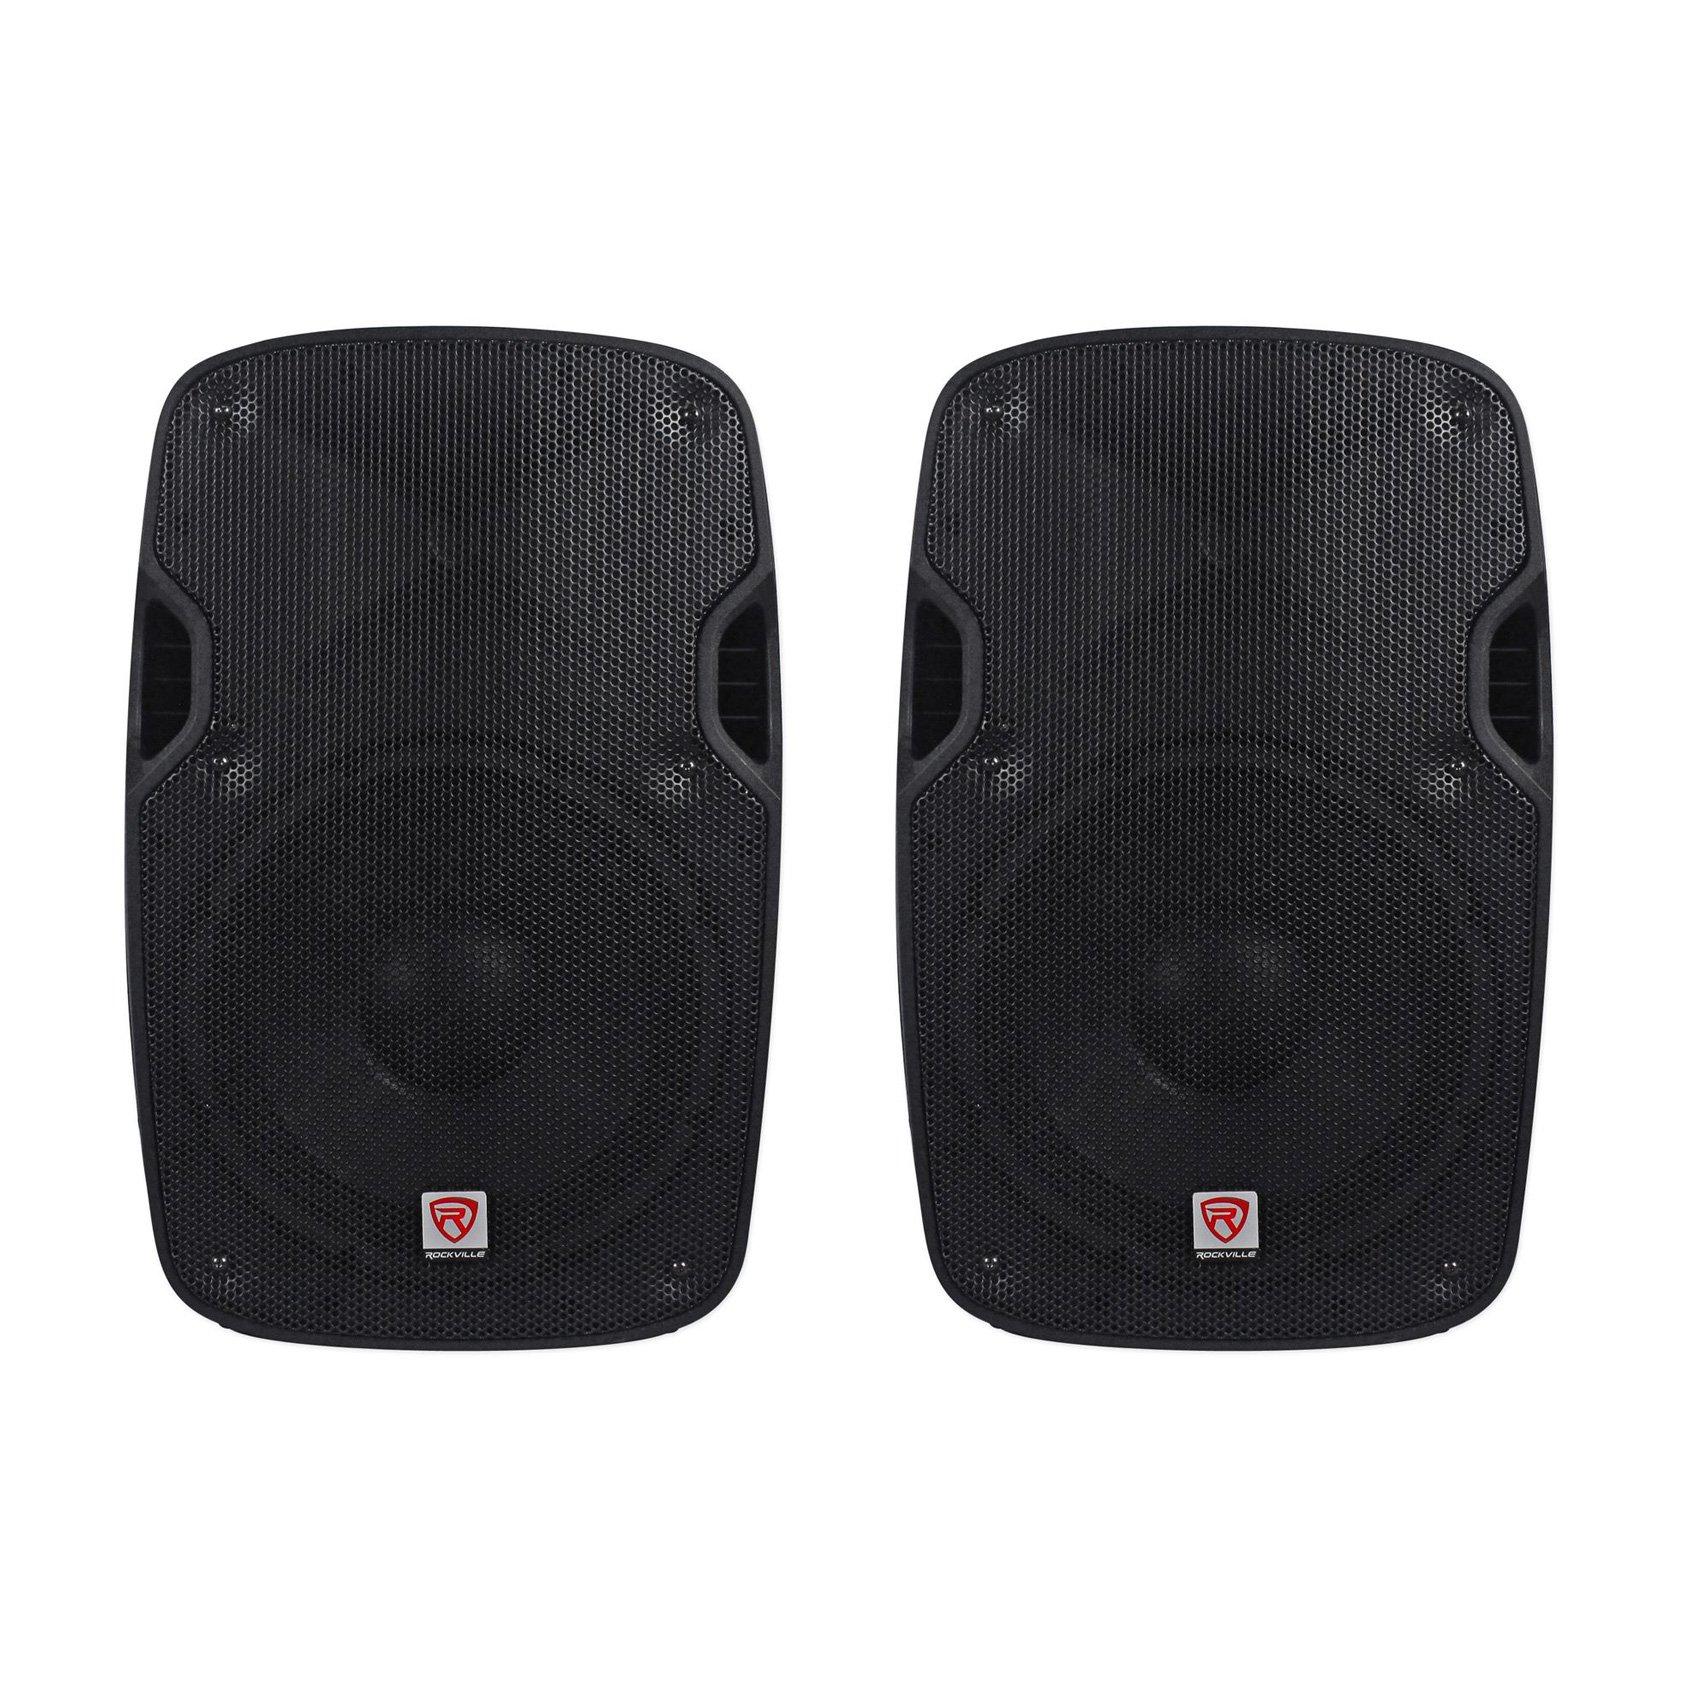 2 Rockville SPGN104 10'' Passive 800W DJ PA Speakers ABS Lightweight Cabinet 4ohm by Rockville